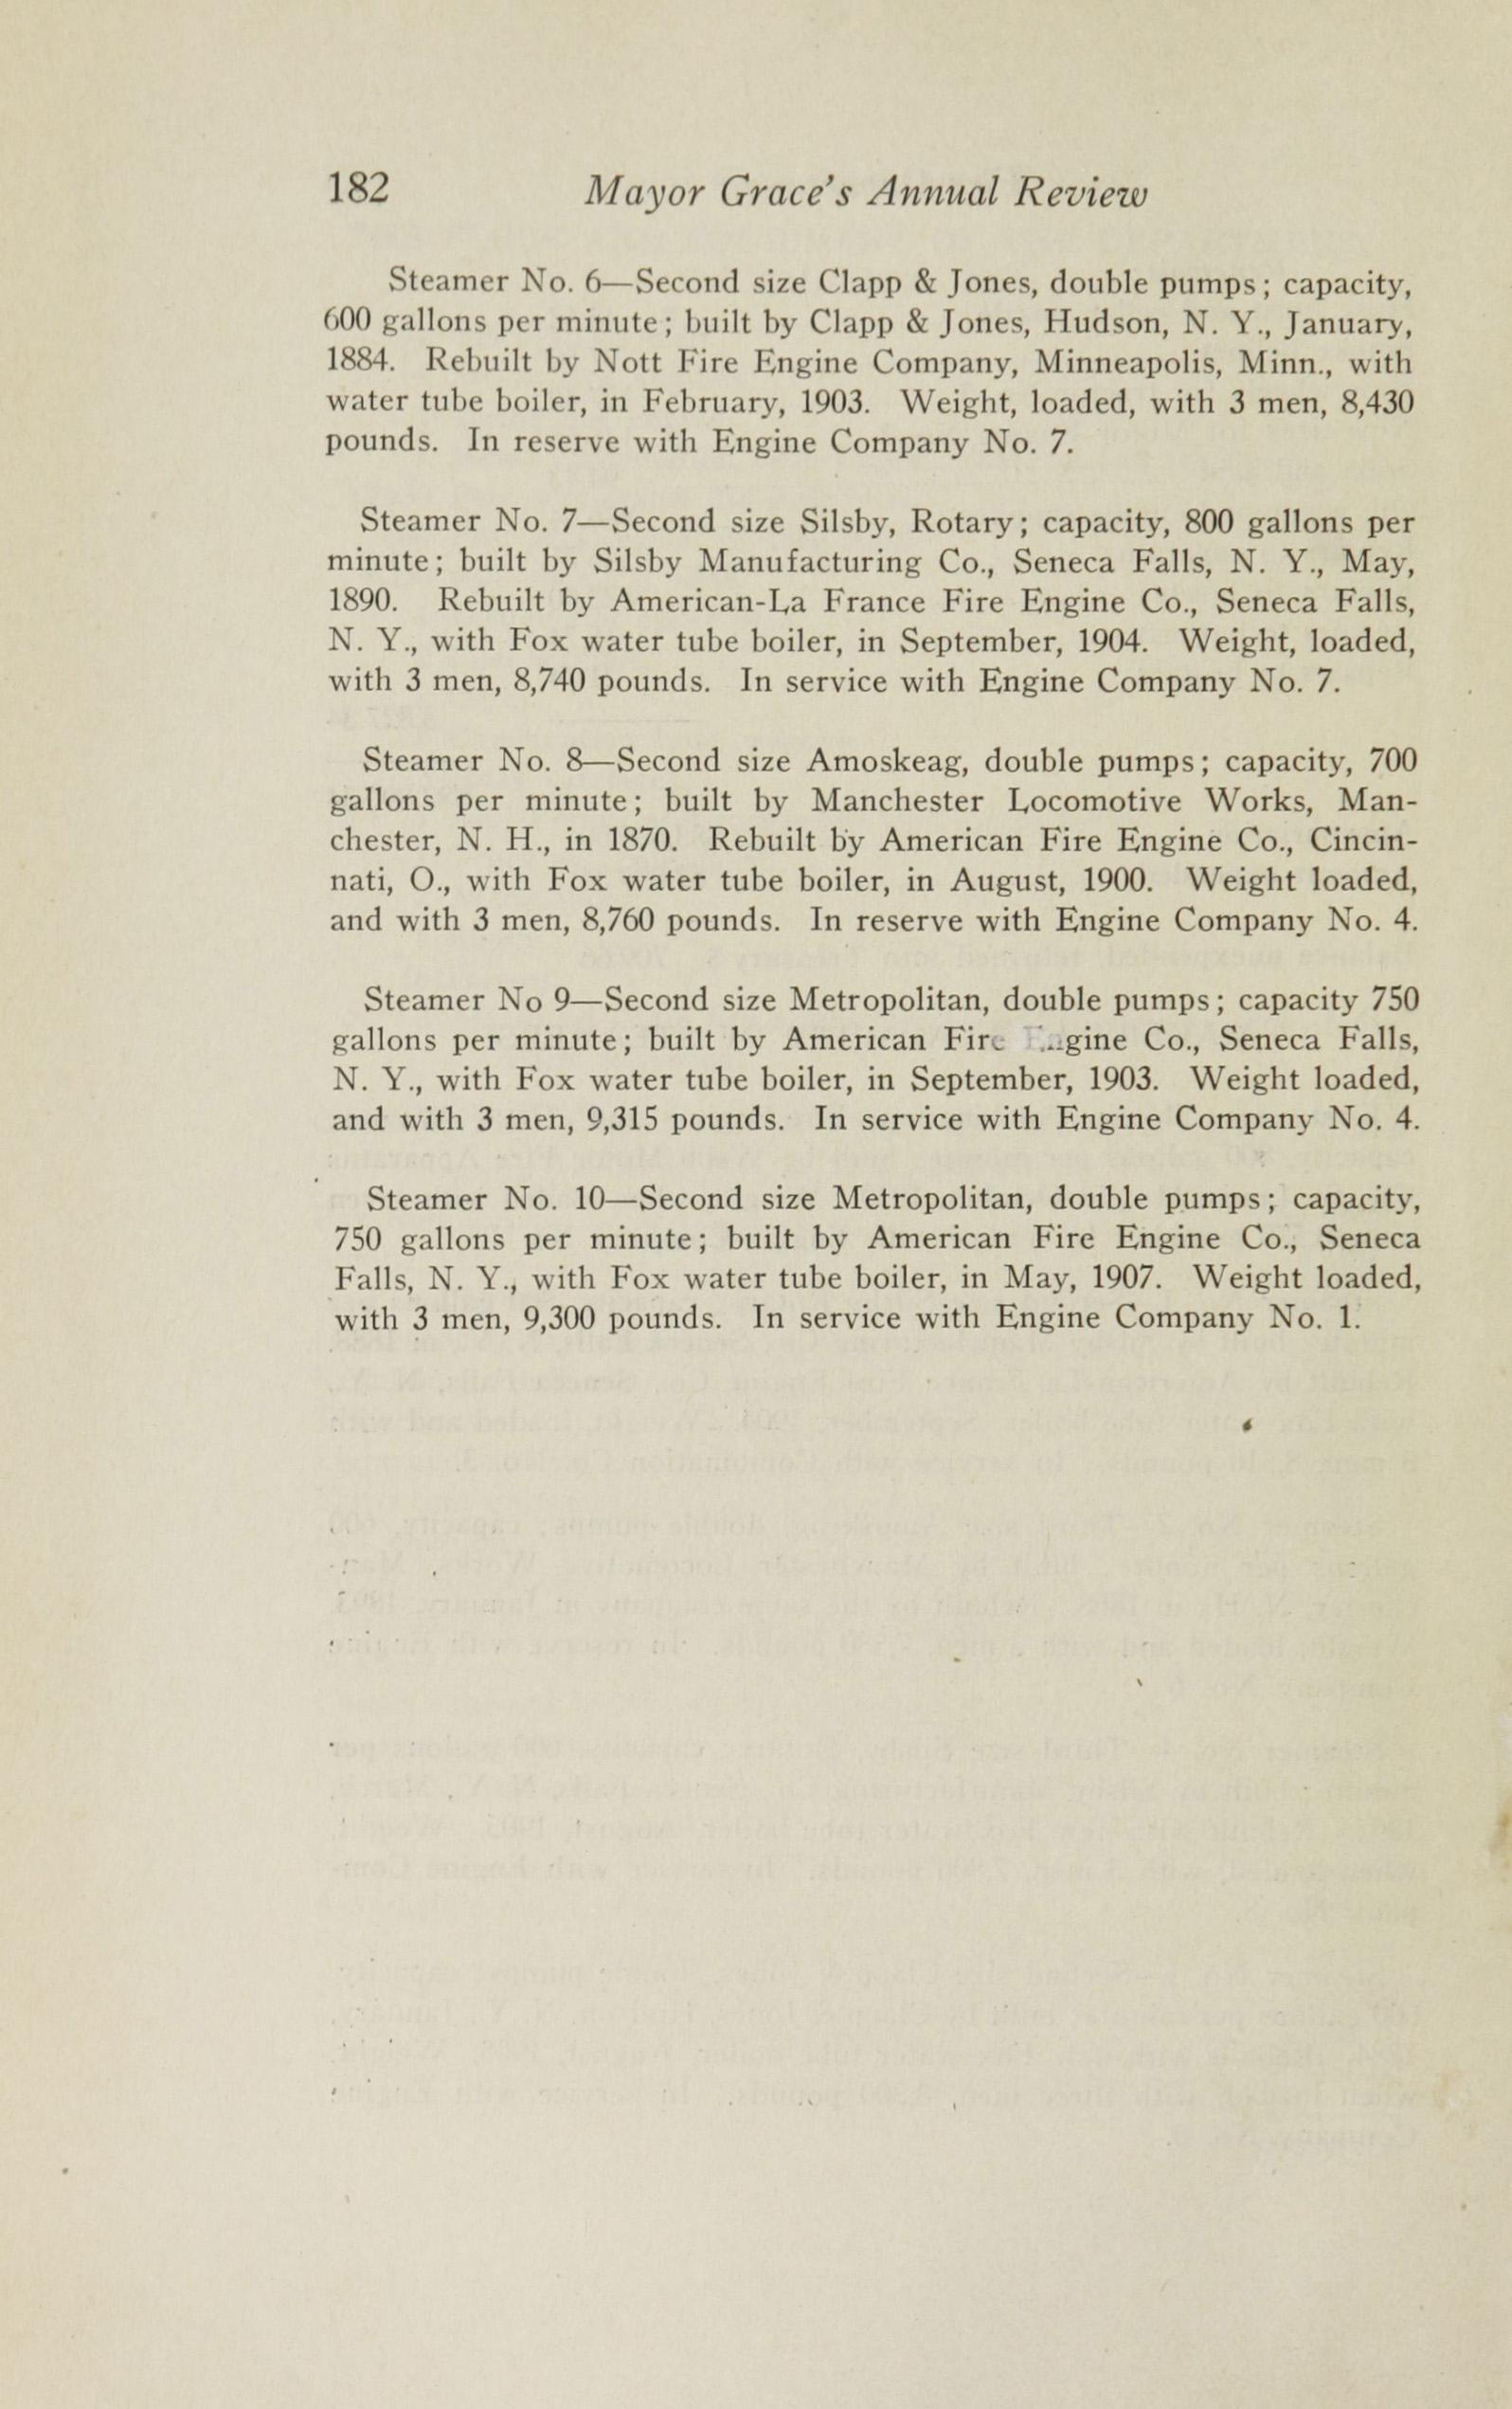 Charleston Yearbook, 1913, page 182